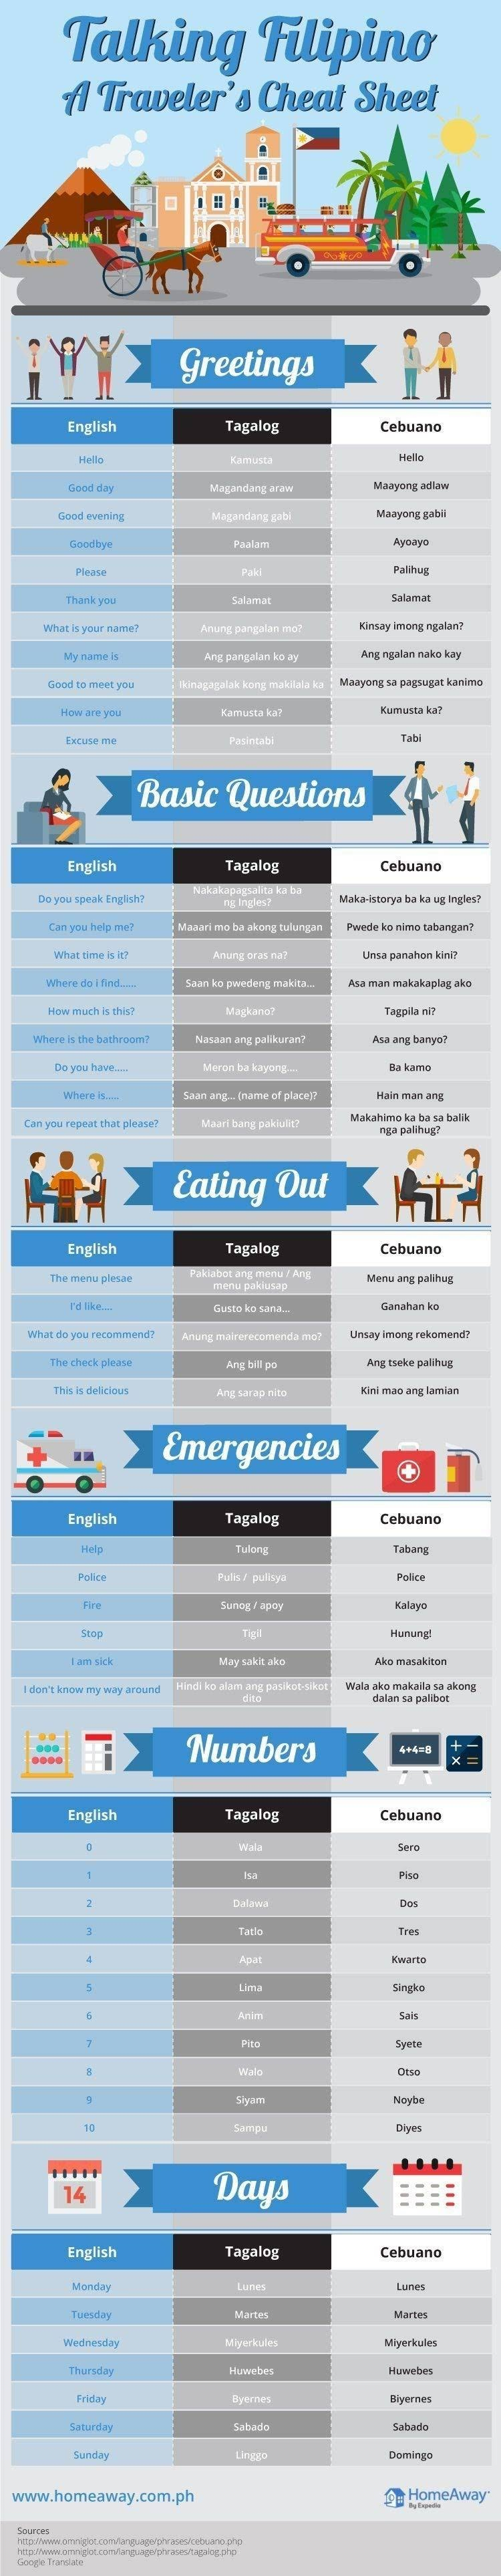 Talking Filipino, A Traveler's Cheat Sheet #infographic